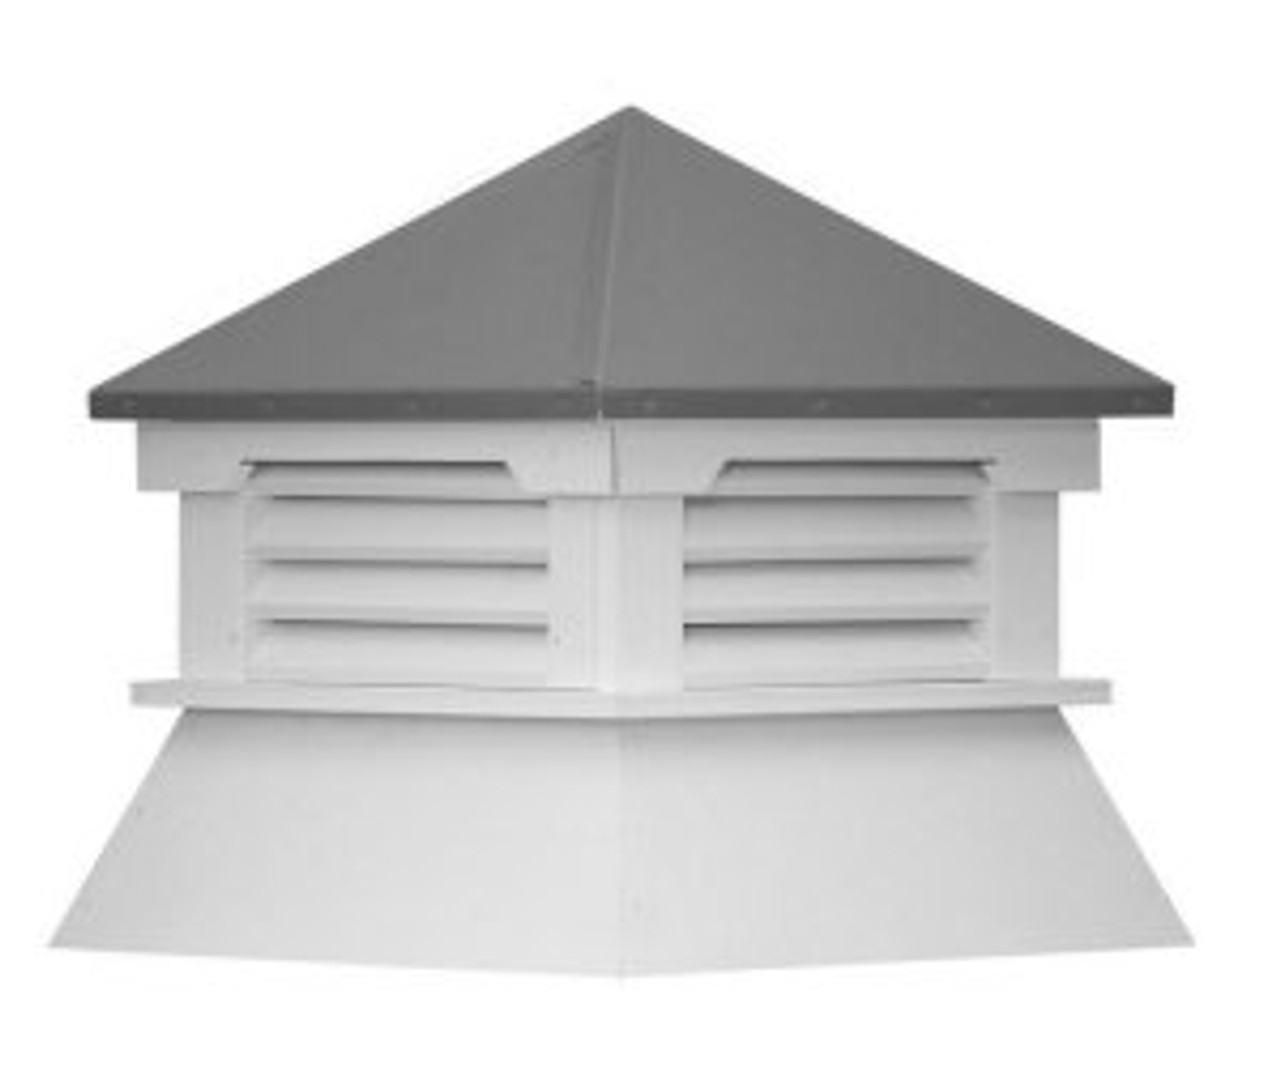 Cupola - Classic Shed: Azek - Aluminum Top - 25Lx25Wx30H